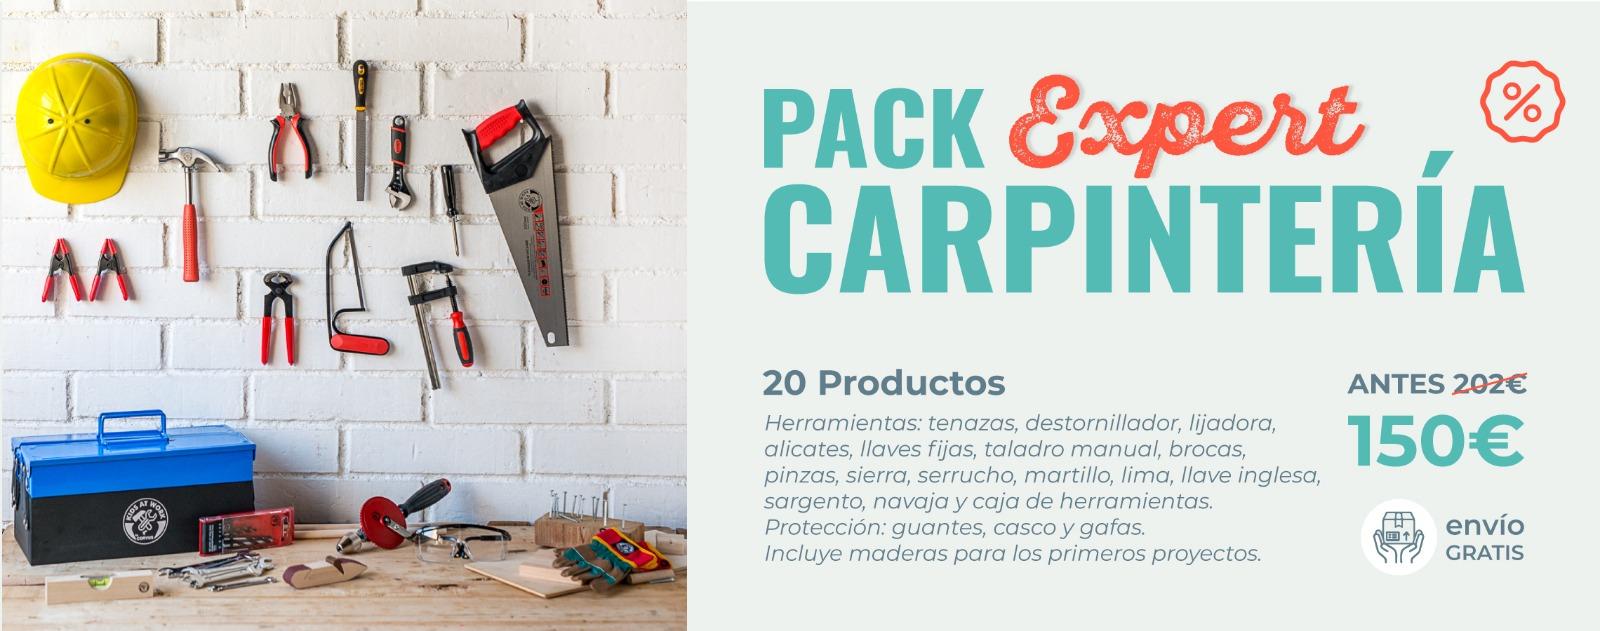 Pack de maderas y herramientas EXPERT